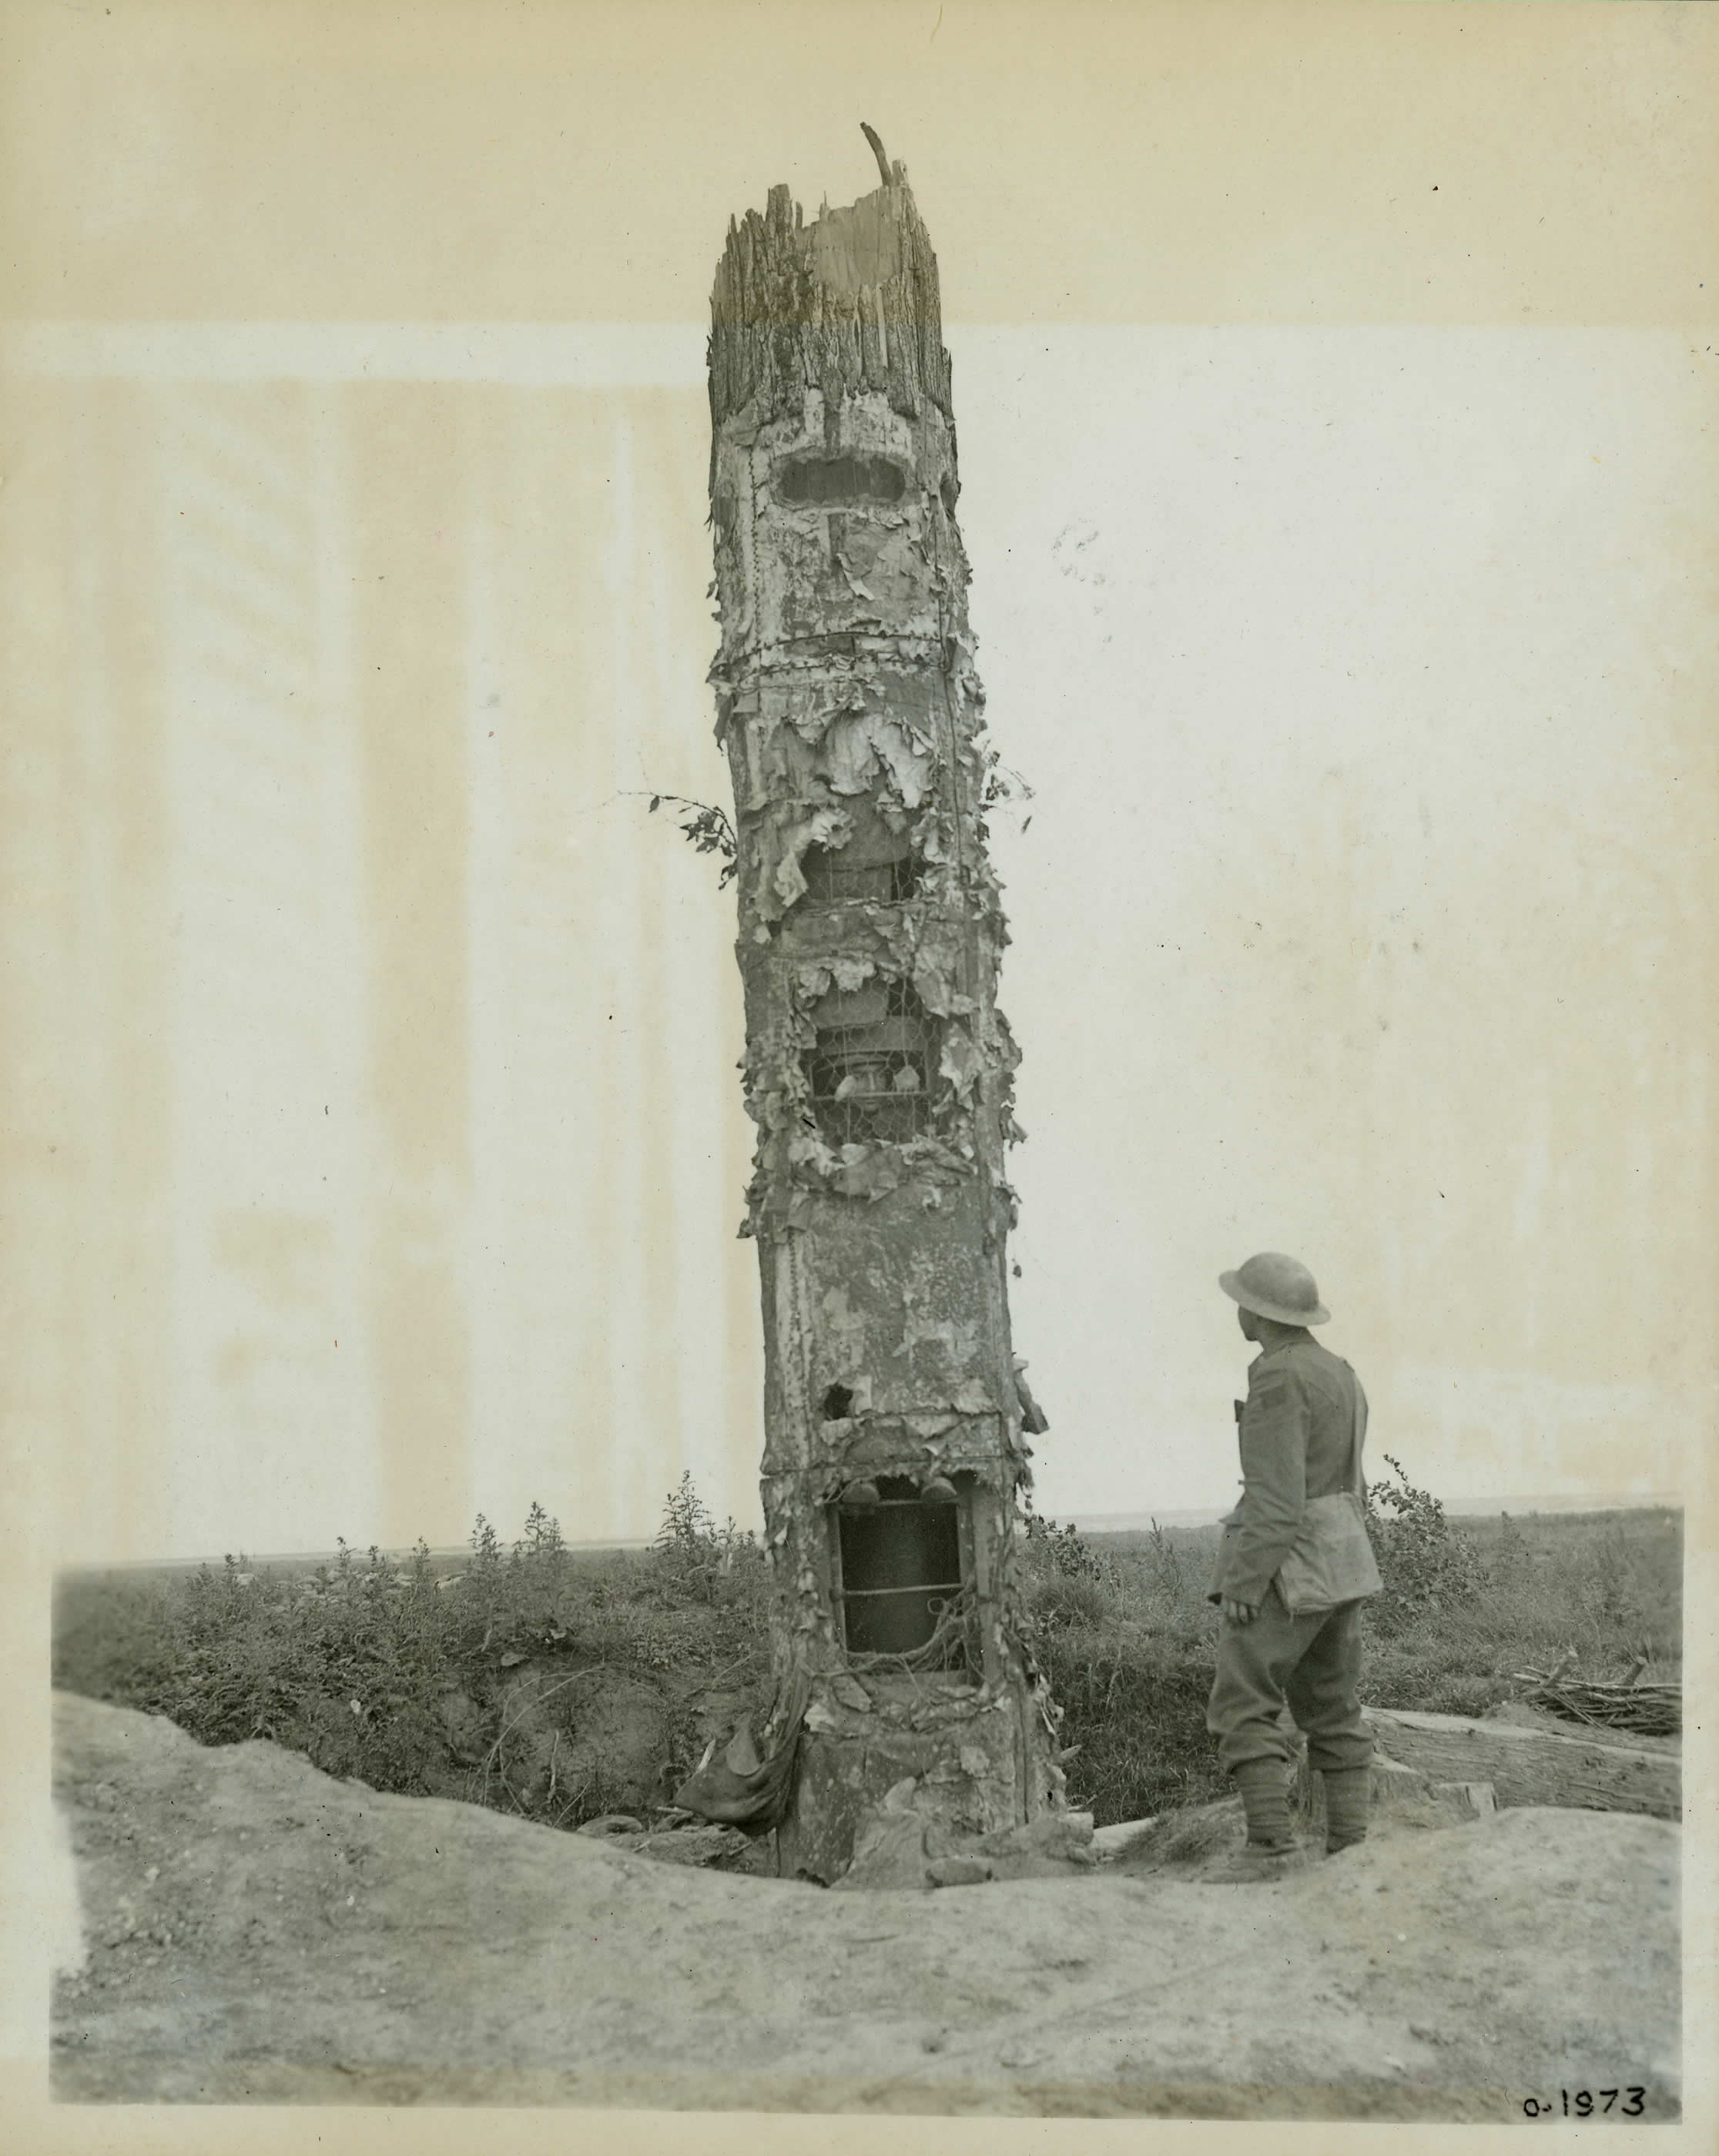 Tree Trunk Observation Post